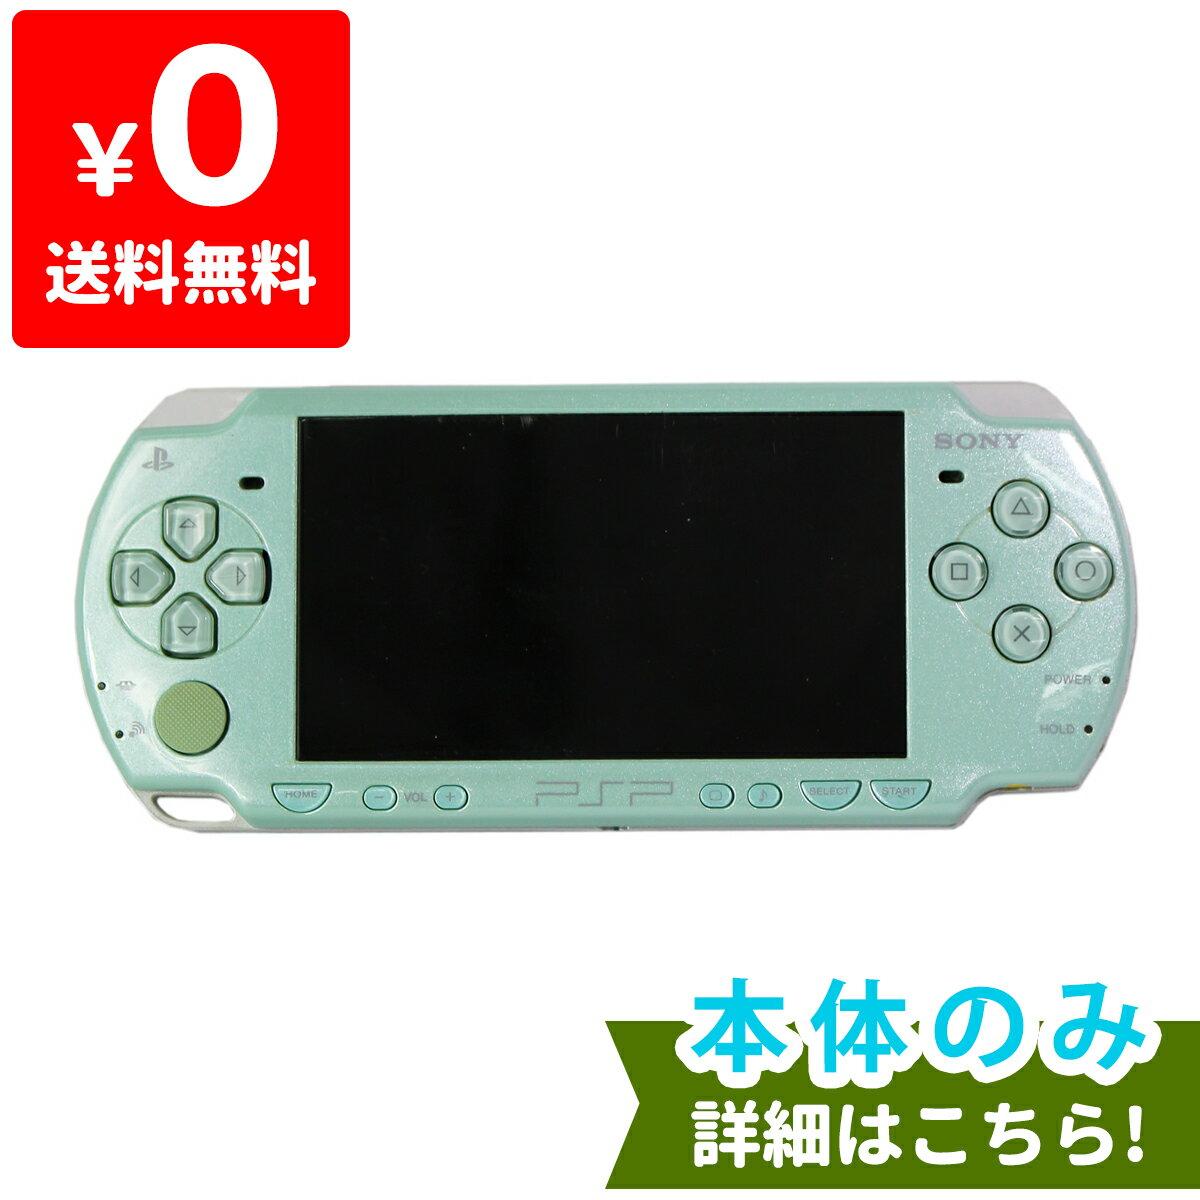 PSP PSP-2000 PSP2000 ミント グリーン 本体のみ 本体単品 プレイステーションポータブル SONY ソニー 中古 4948872411561 送料無料